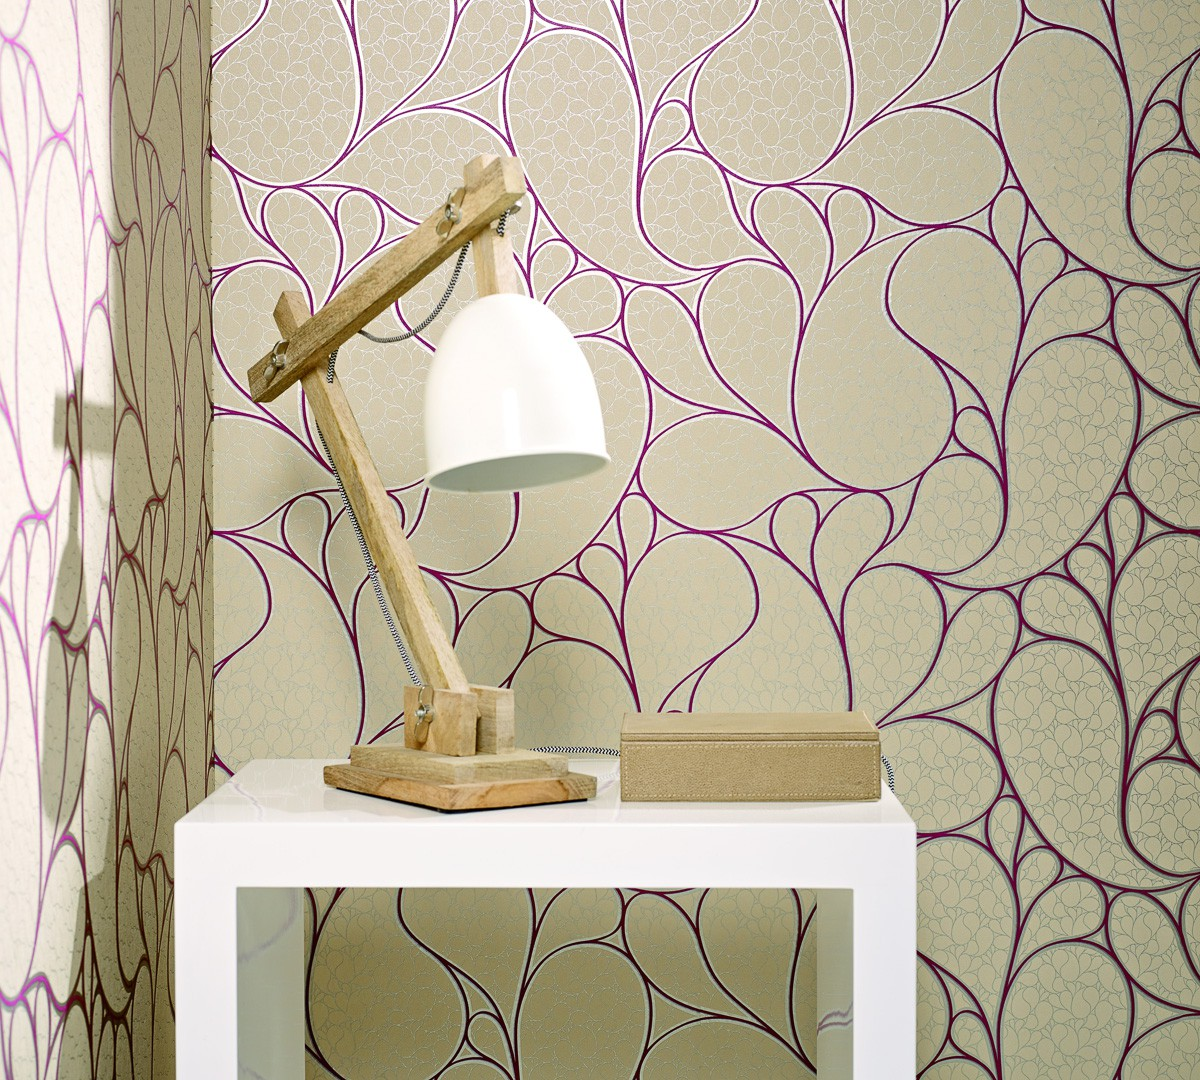 vliestapete marburg messina tapete 55425 design modern. Black Bedroom Furniture Sets. Home Design Ideas